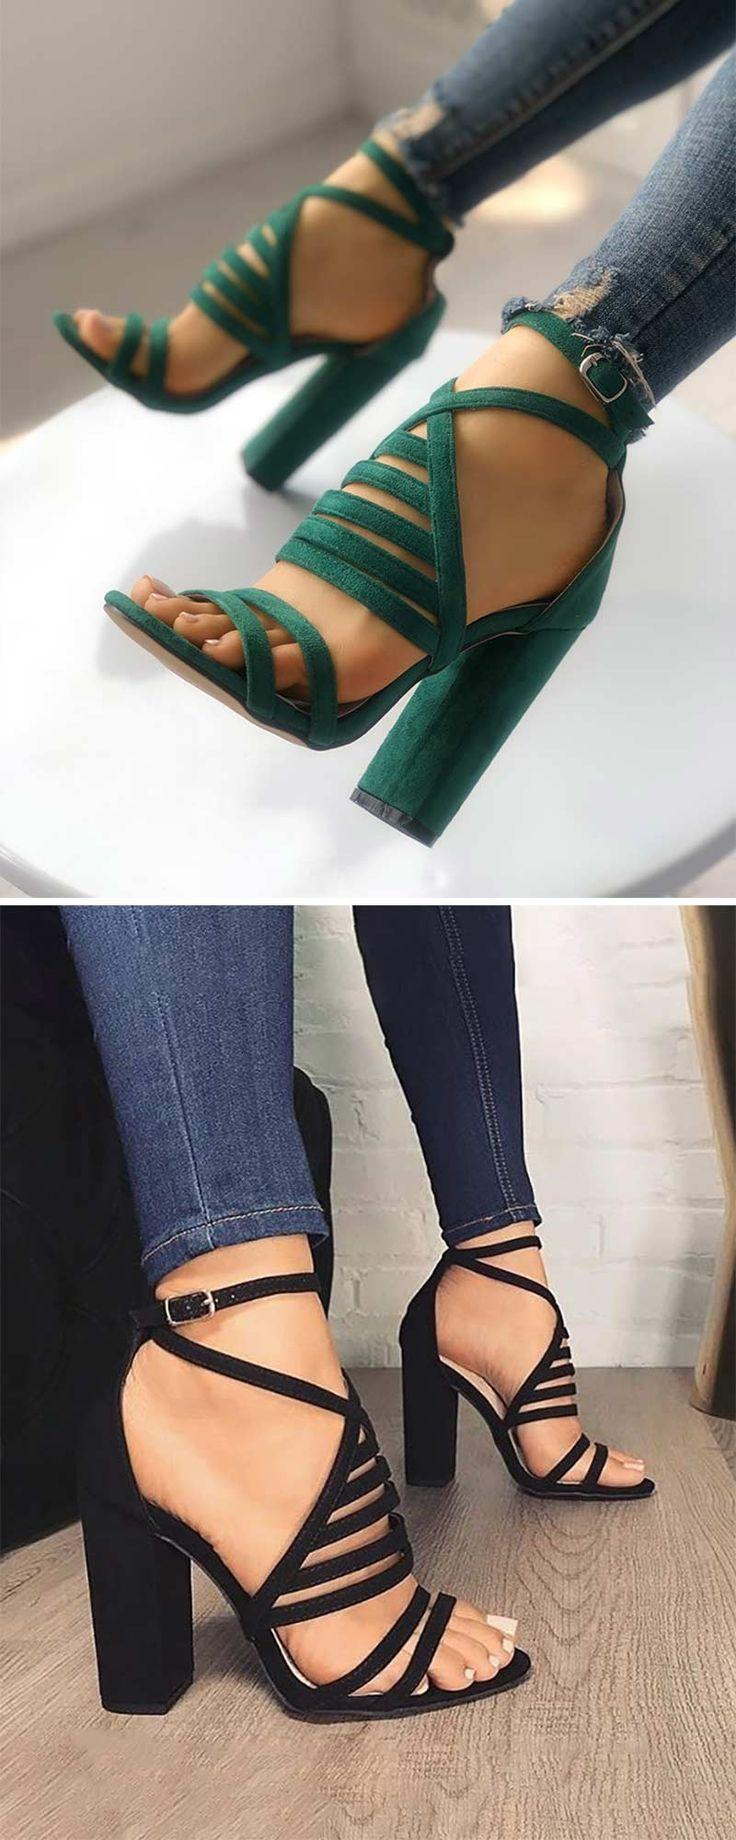 Свадьба - Strappy Open Toe Stiletto Sandals